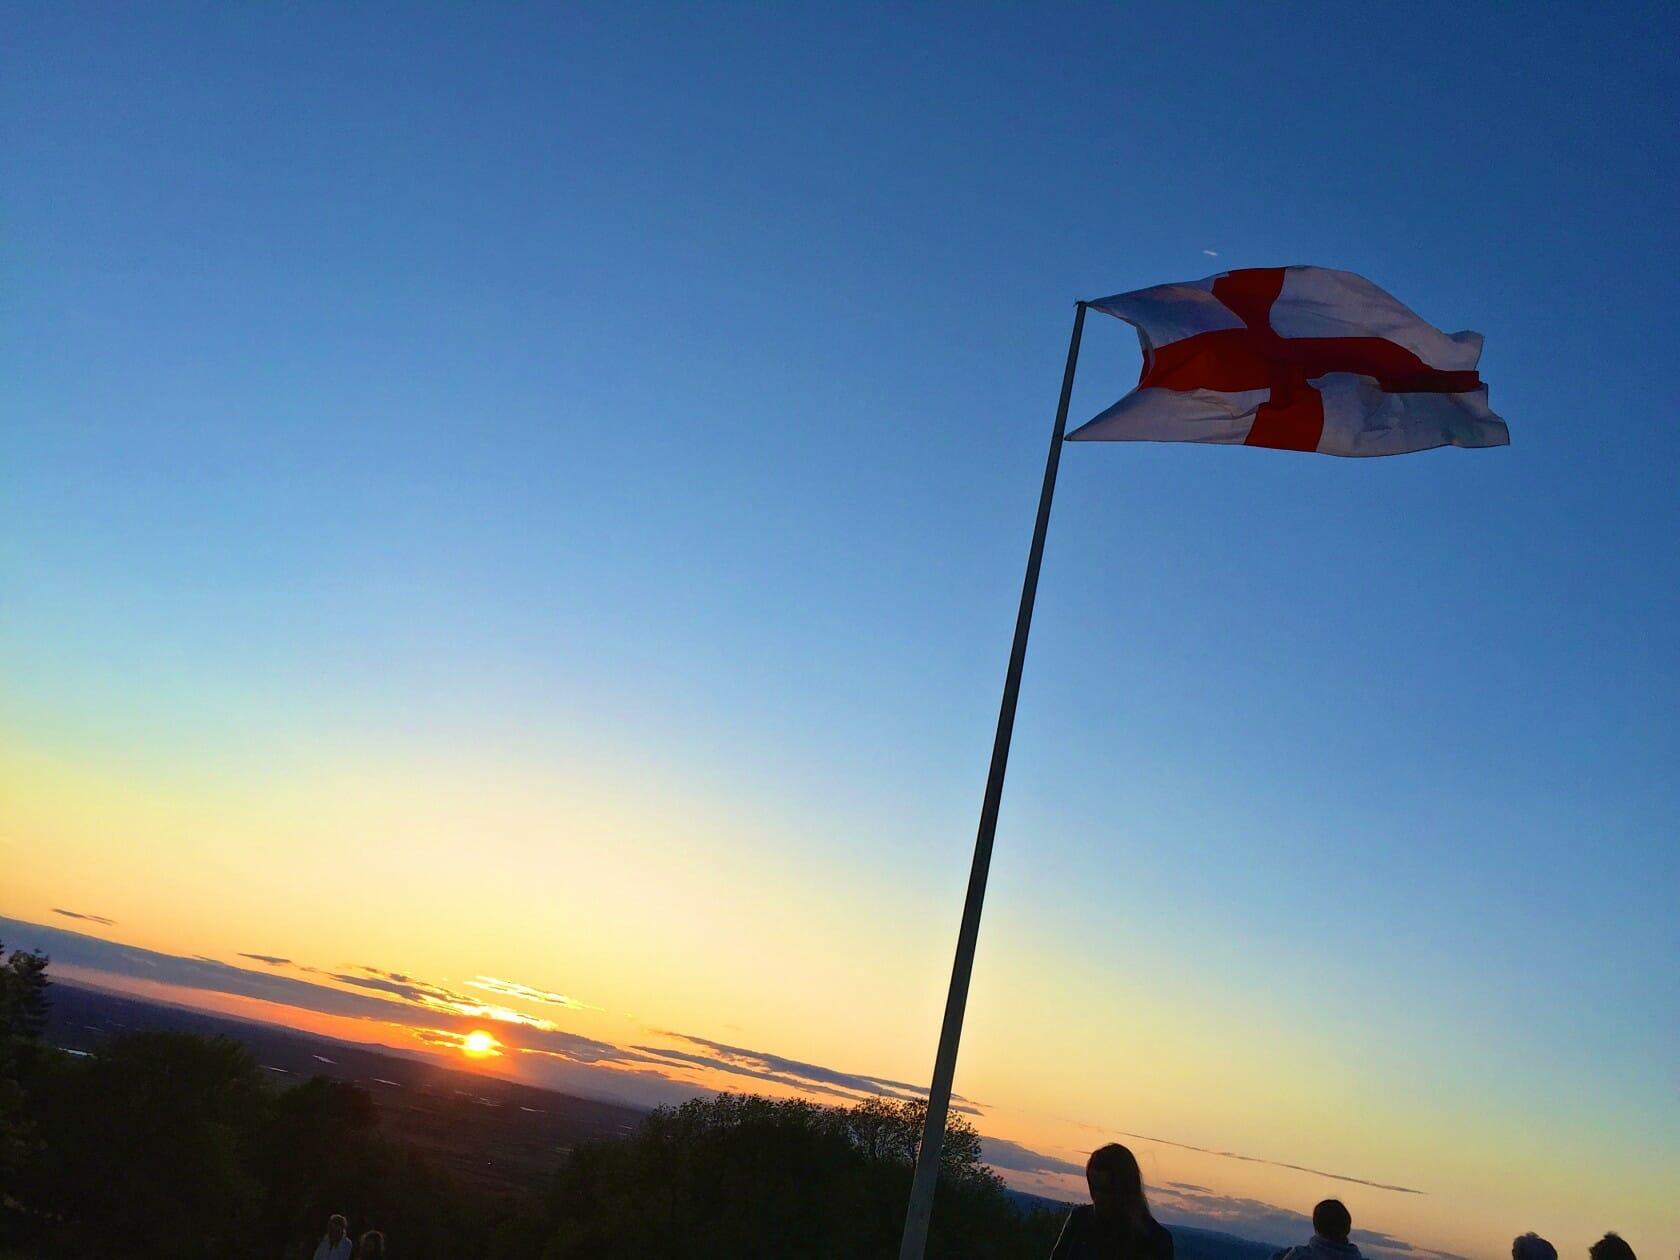 Cotswold Olimpicks dover games england